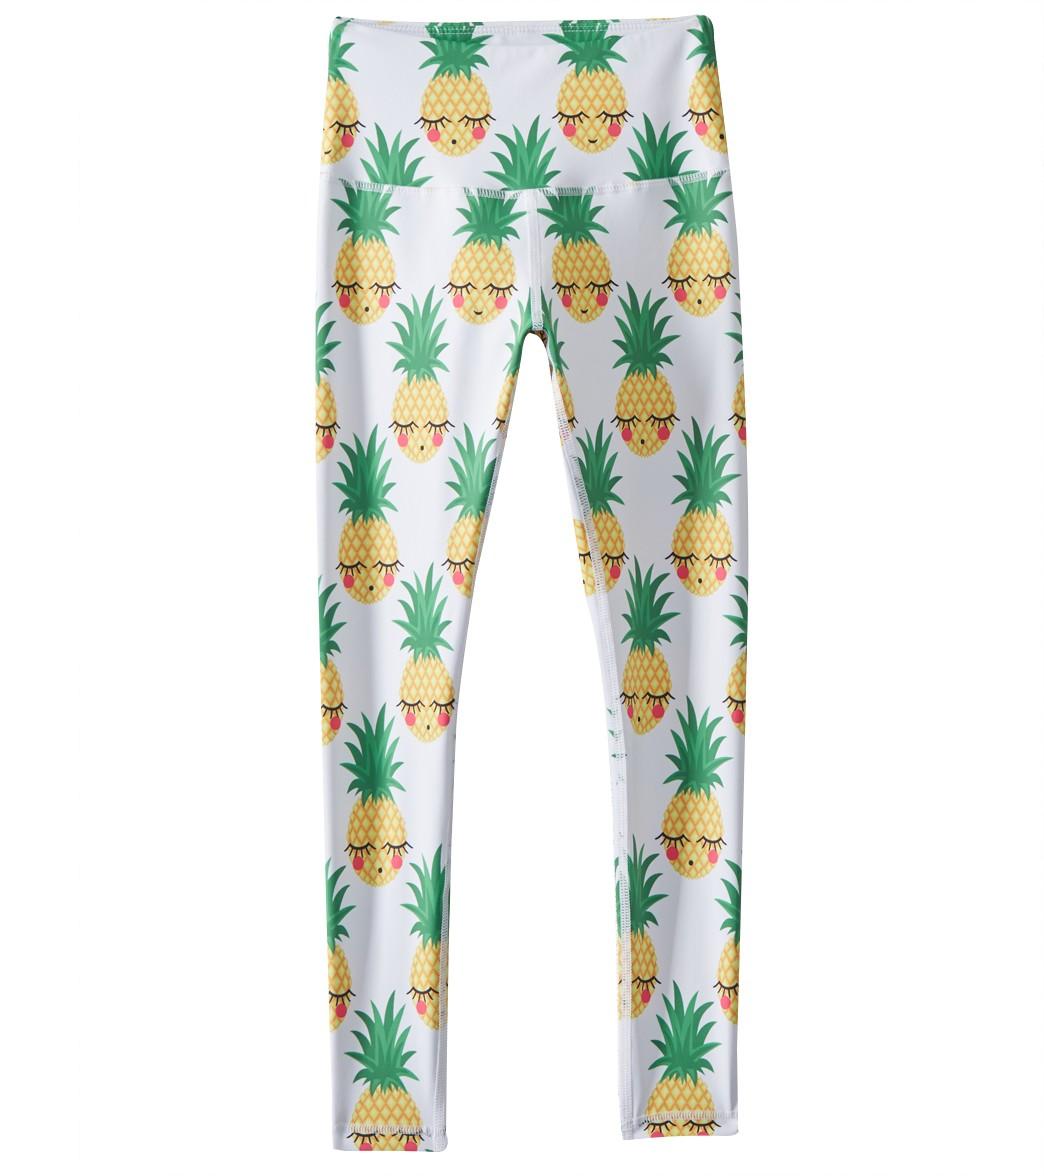 bdbe82538e0fb Flexi Lexi Girls  Pineapple Flexi Leggings at SwimOutlet.com - Free Shipping